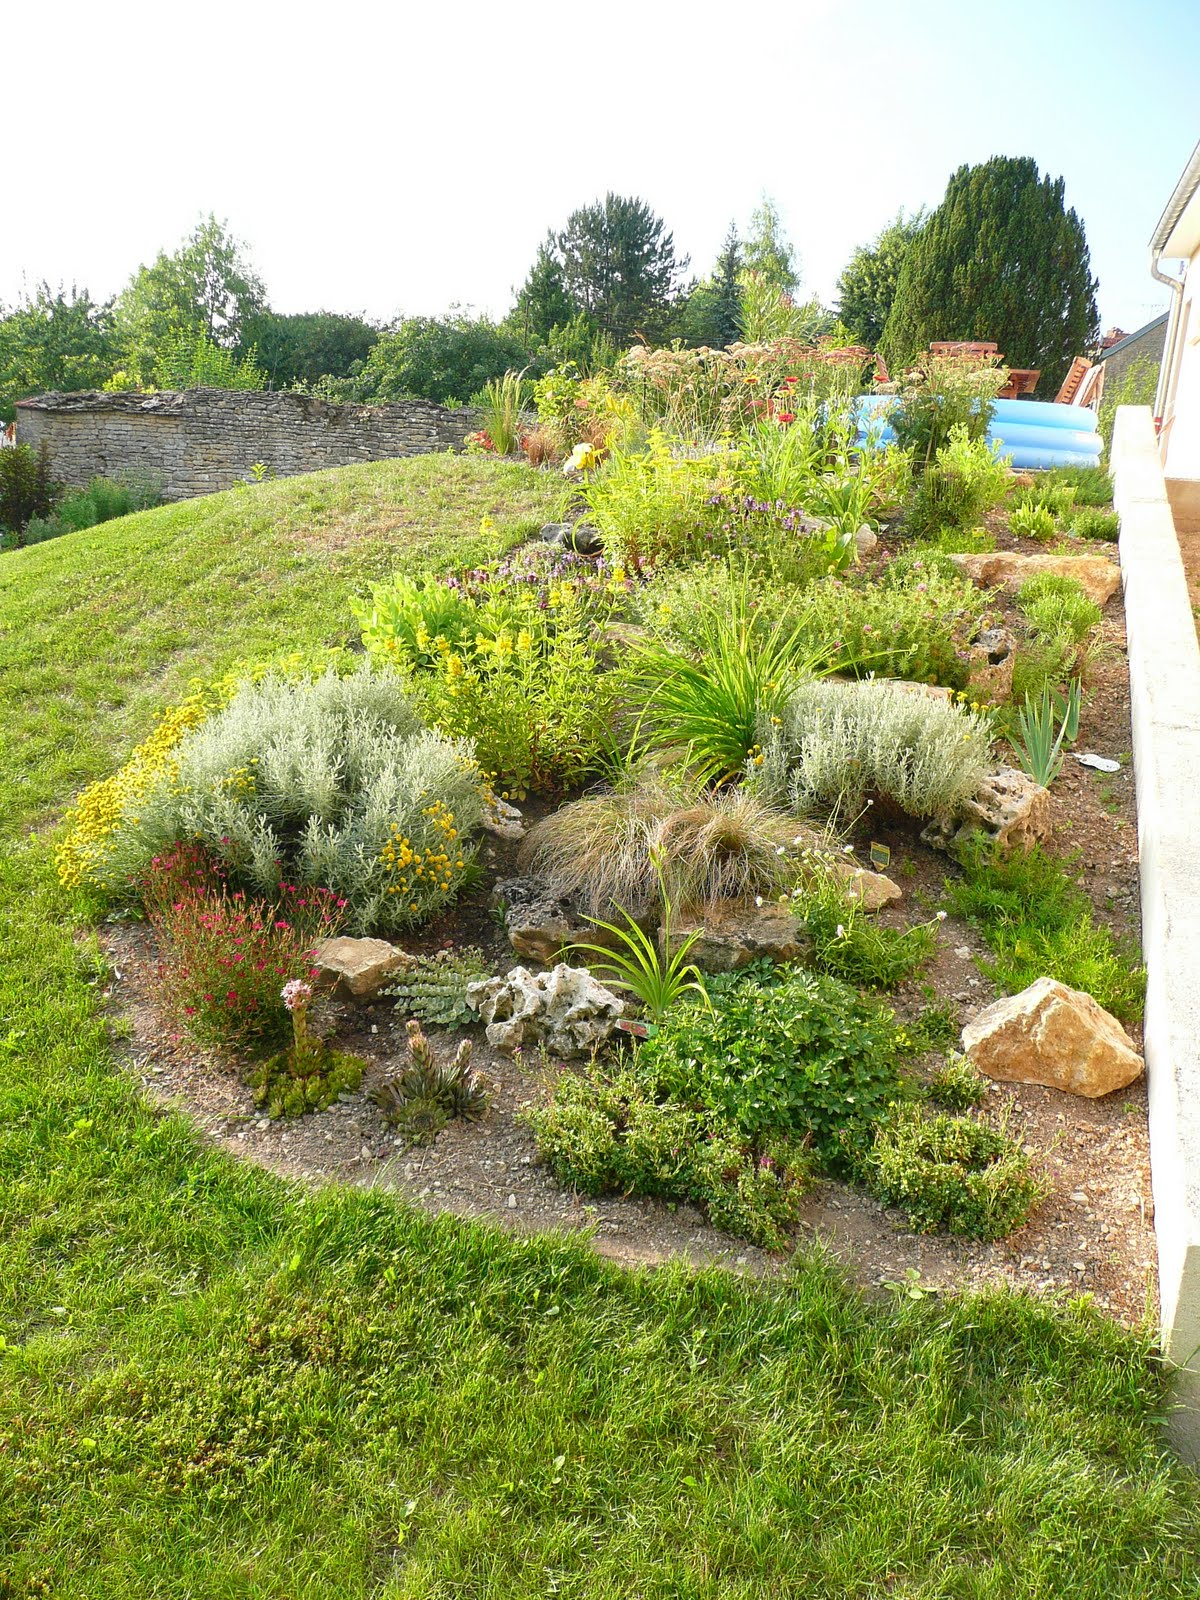 Notre jardin secret.: Rocaille en juillet